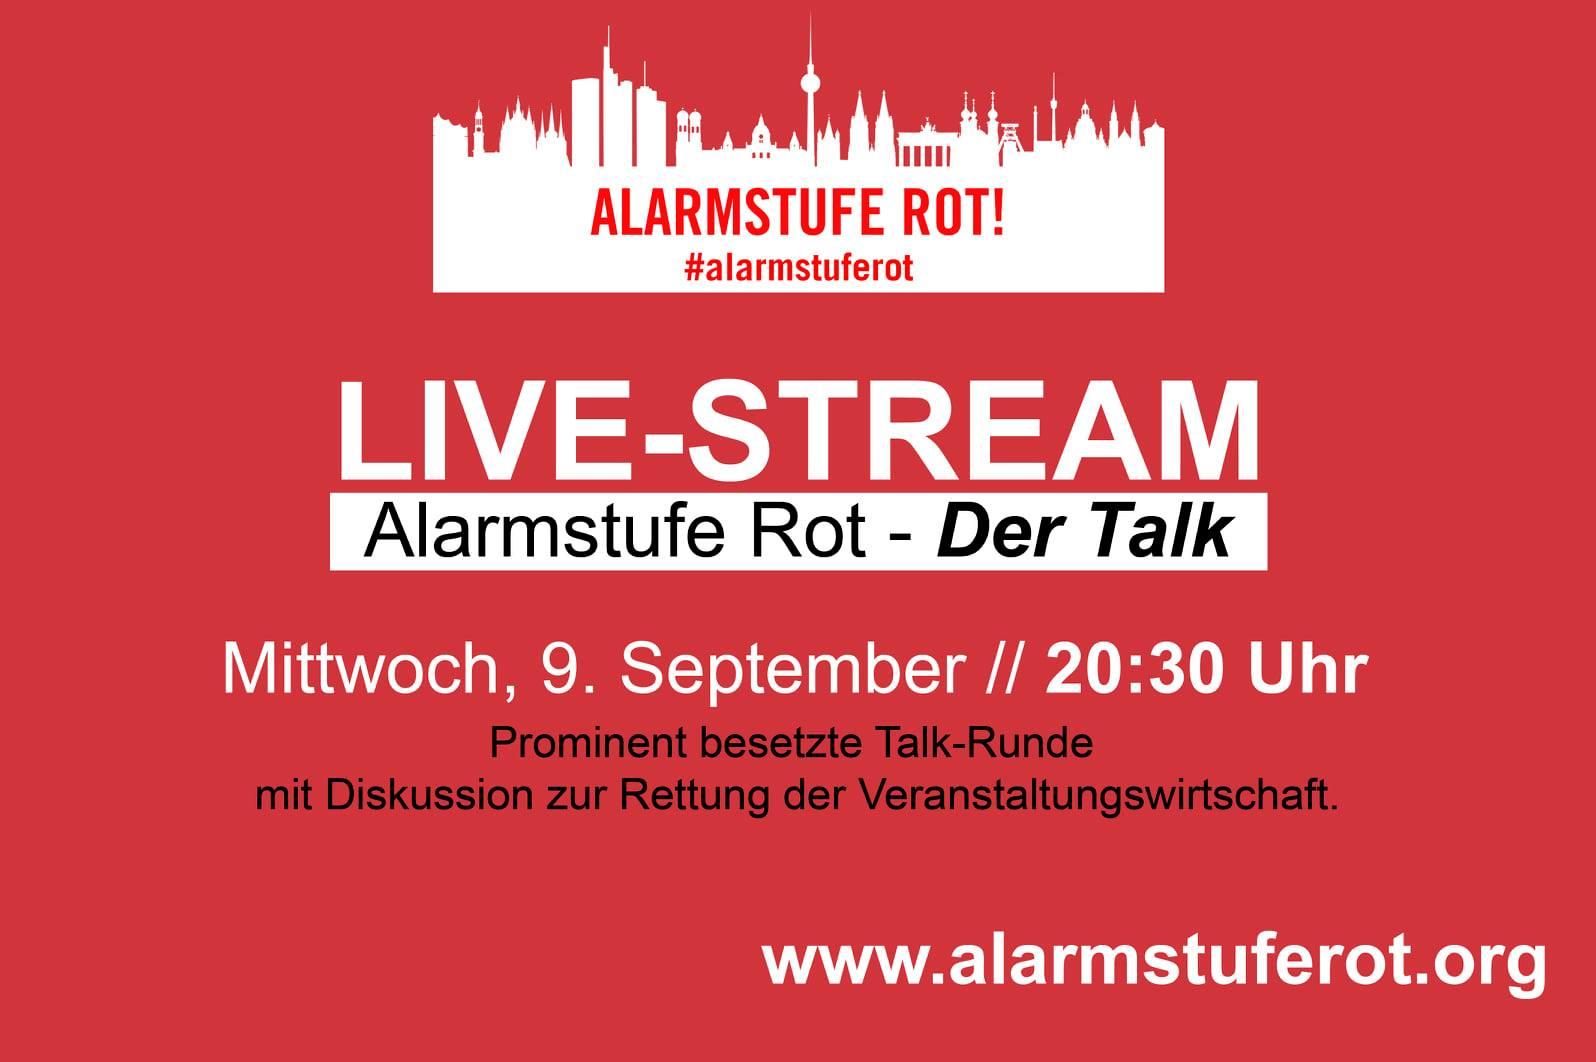 """Alarmstufe Rot""-Demo in Berlin endet mit Live-Talk"